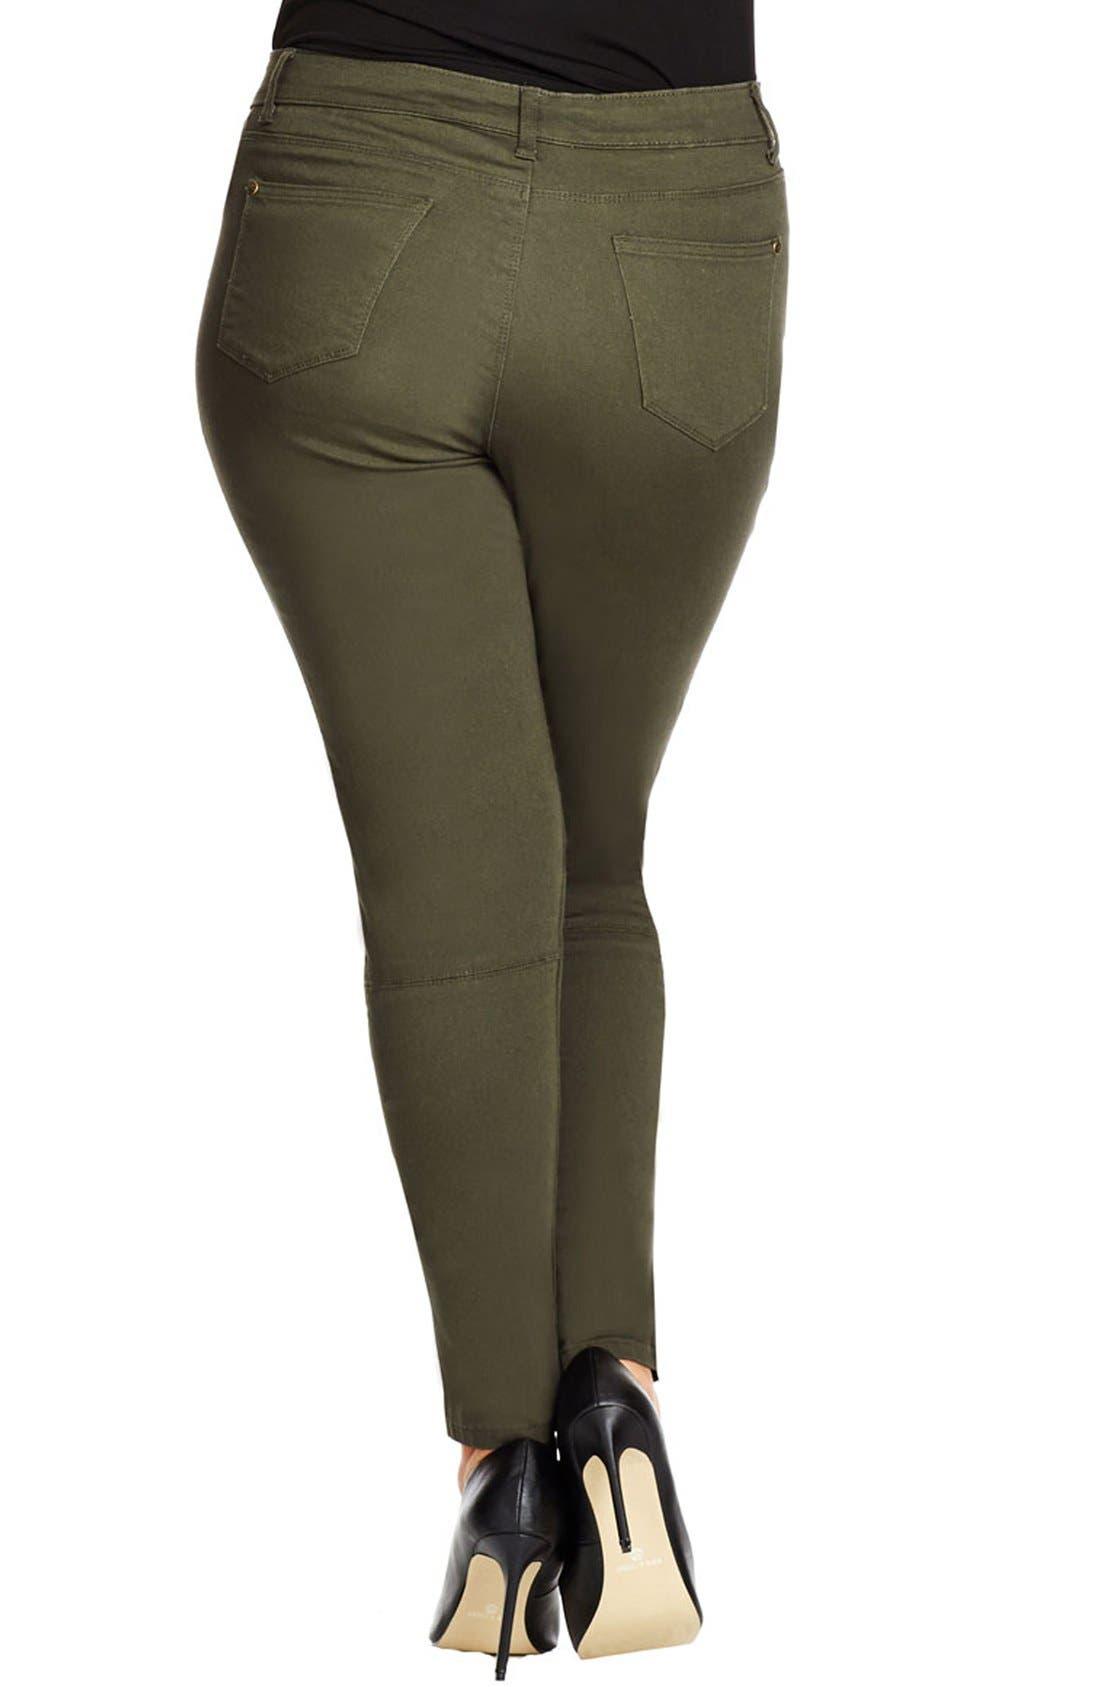 Alternate Image 3  - City Chic 'Commando' Khaki Pants (Plus Size)